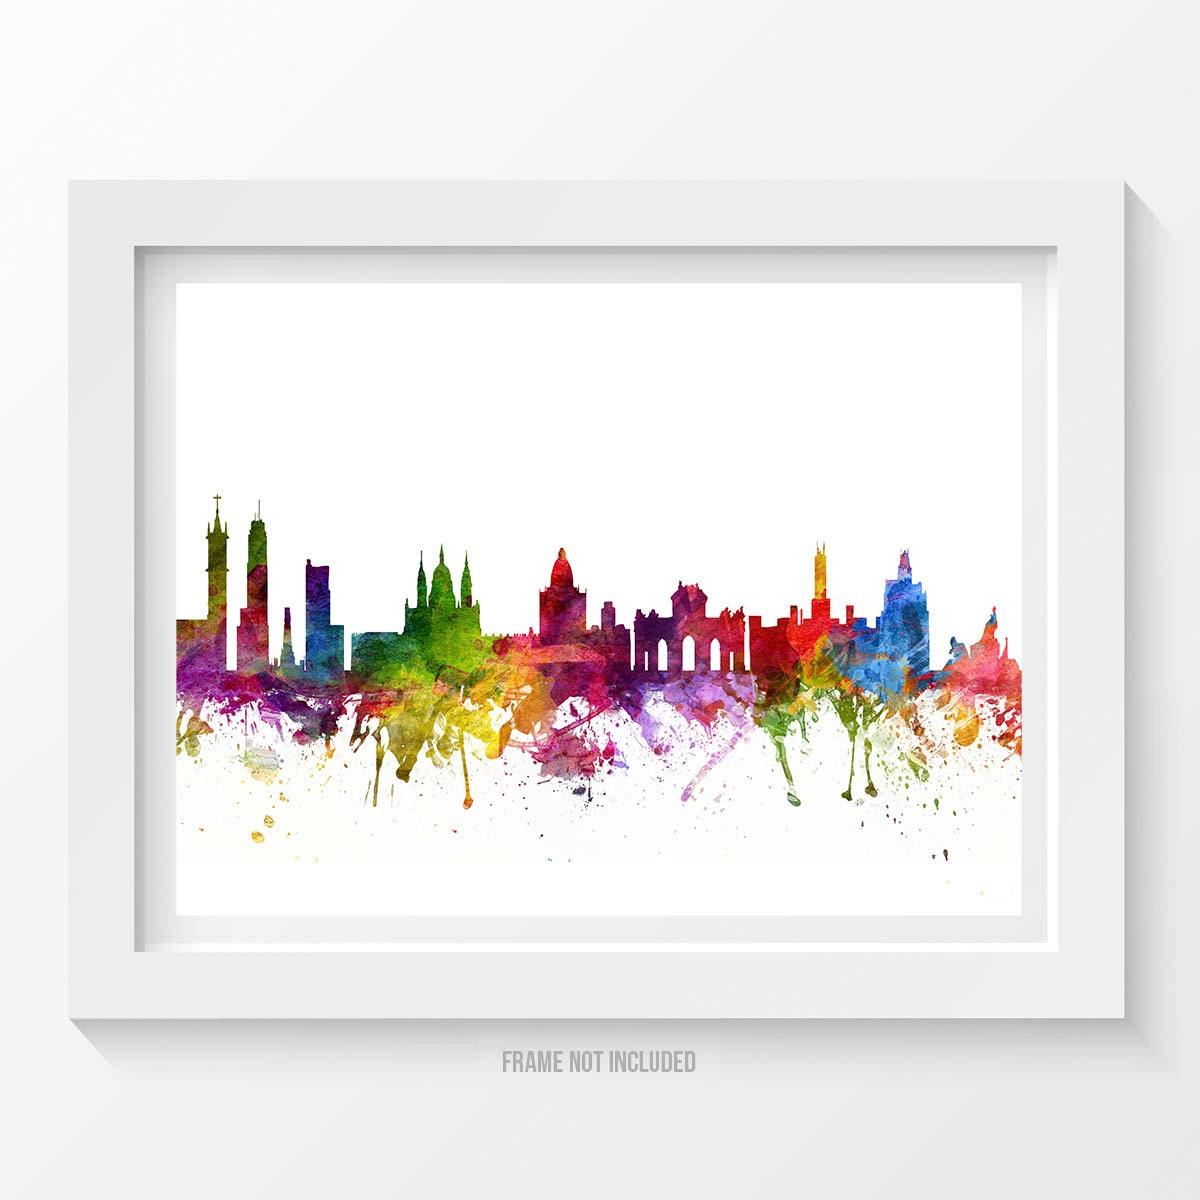 Color art printing anchorage -  Zoom